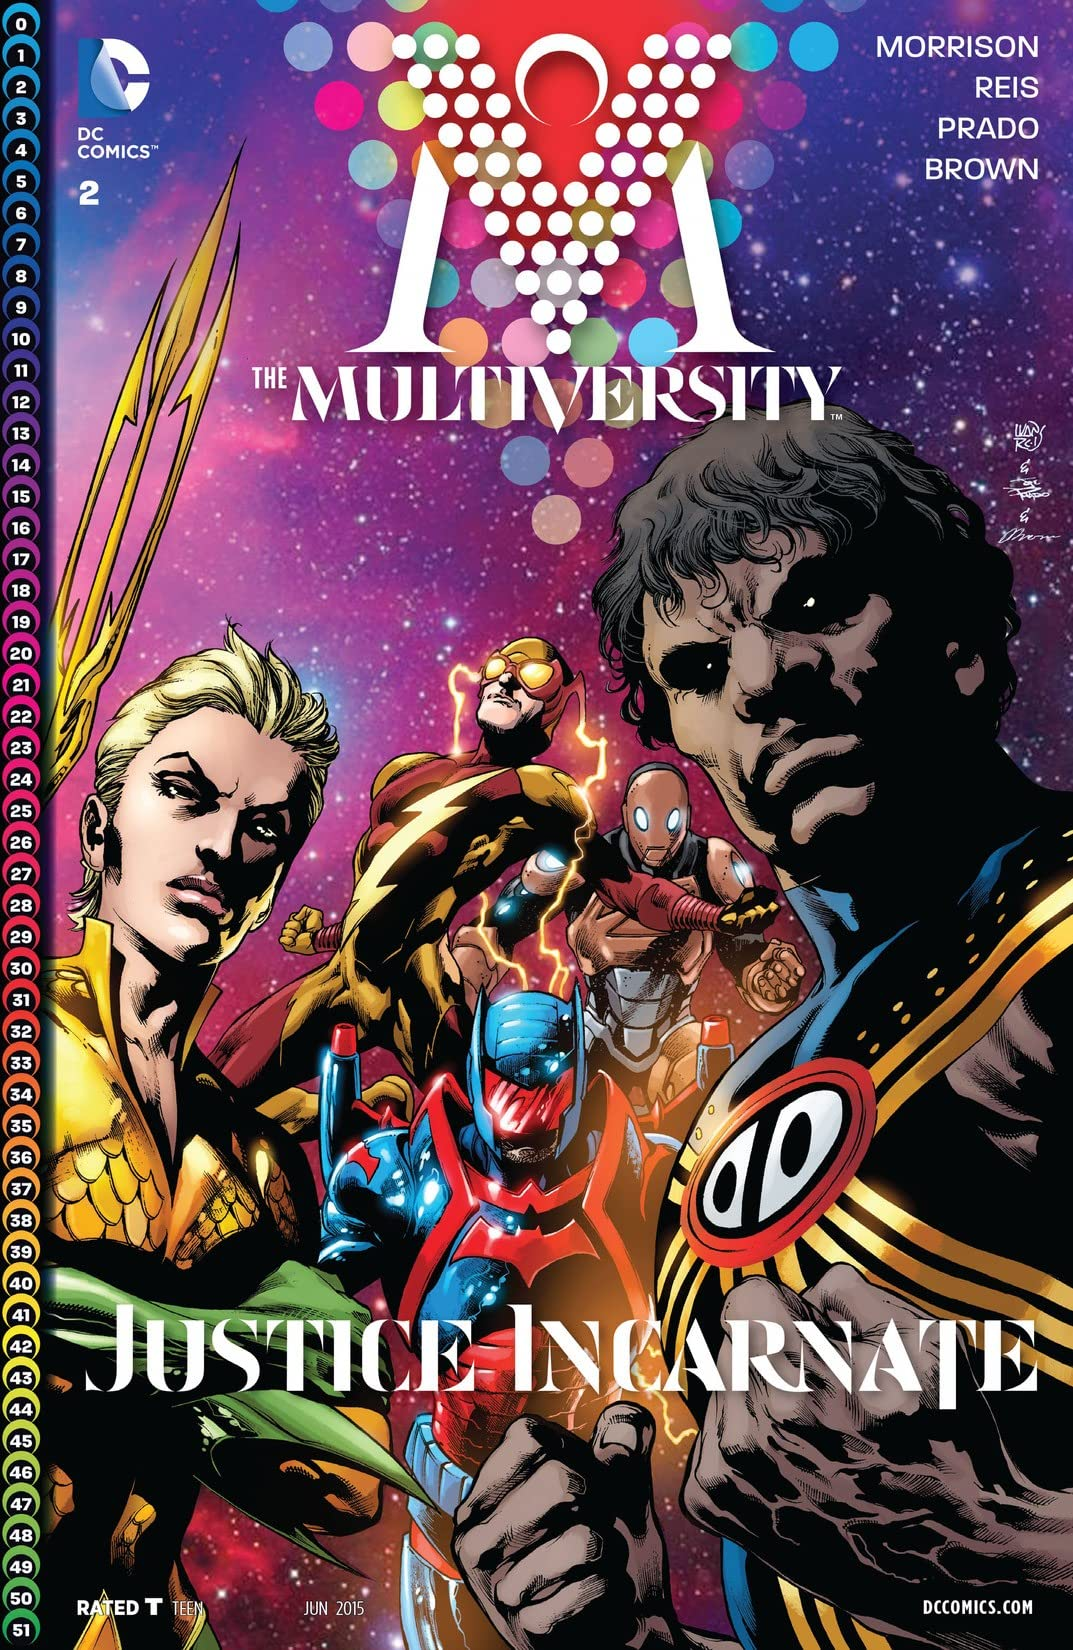 The Multiversity (2014) #2